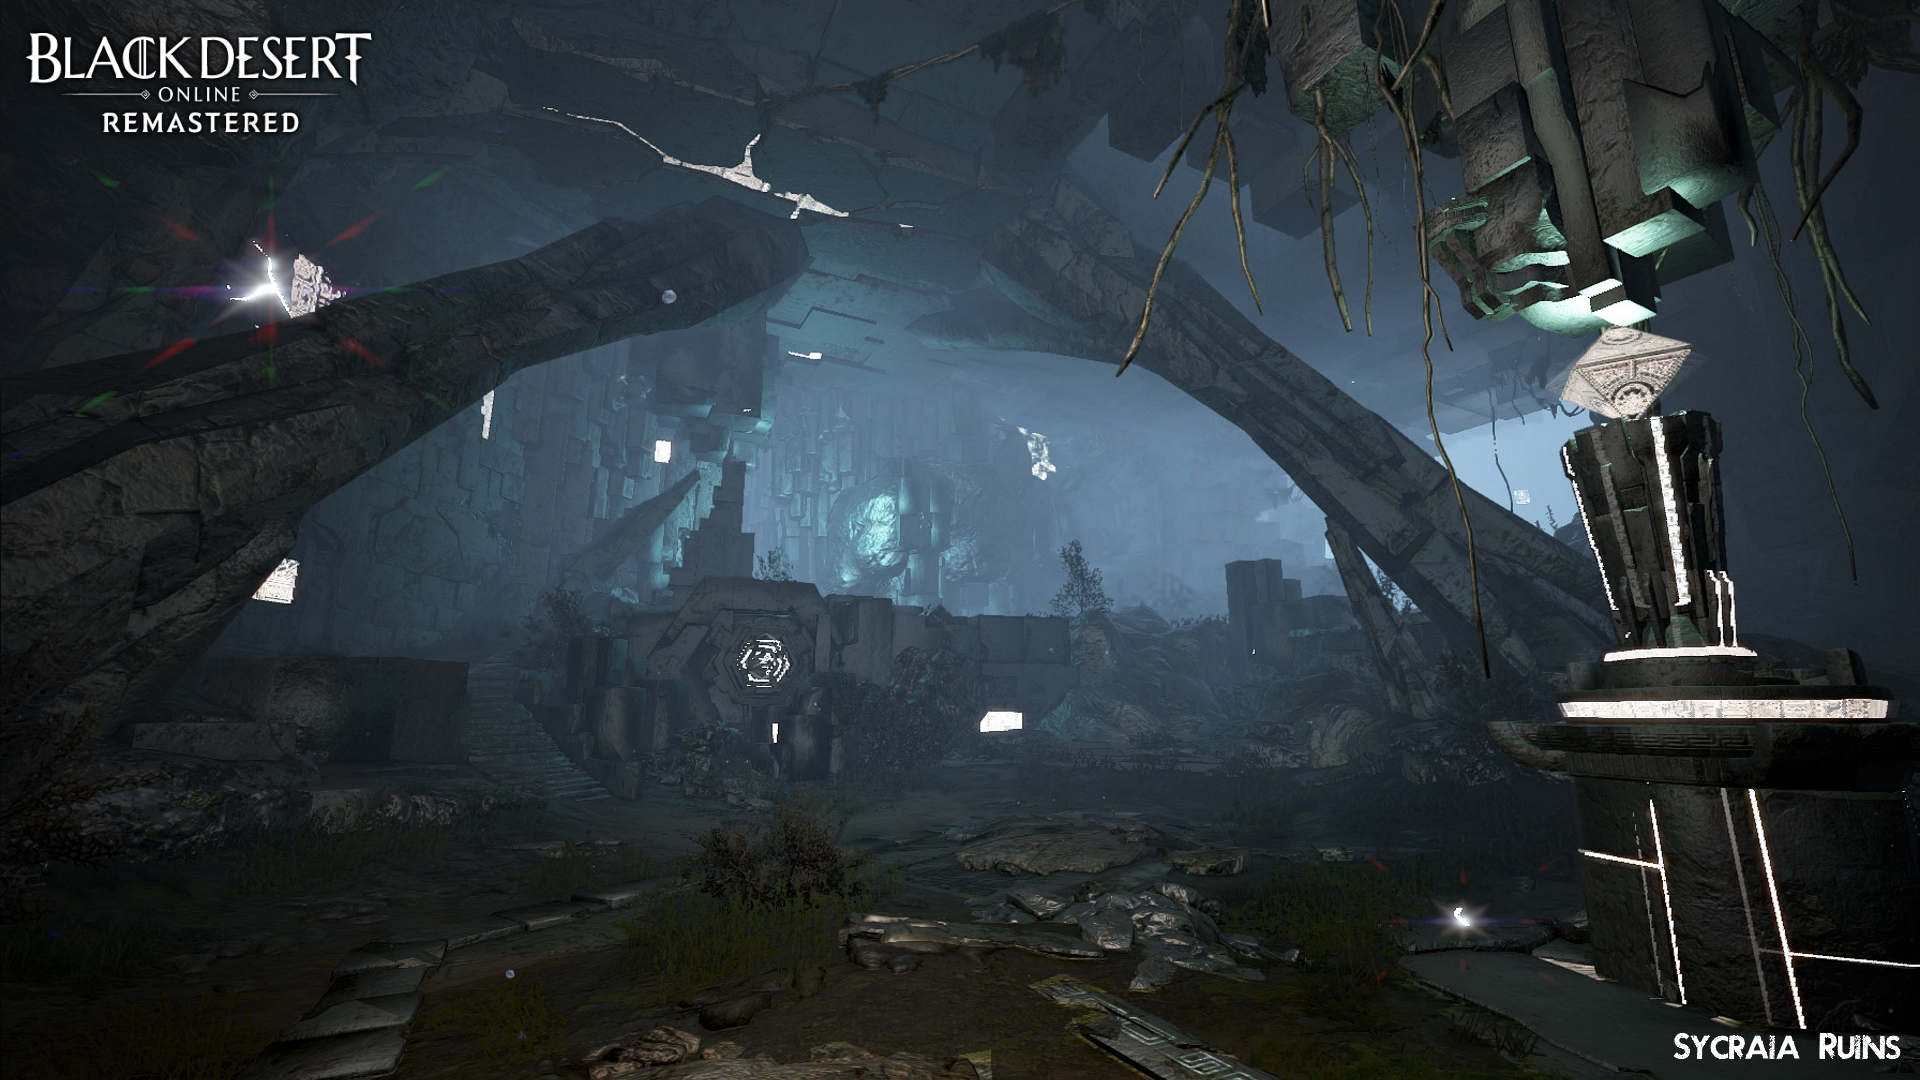 Black Desert Online Sycria Ruins screenshot 2